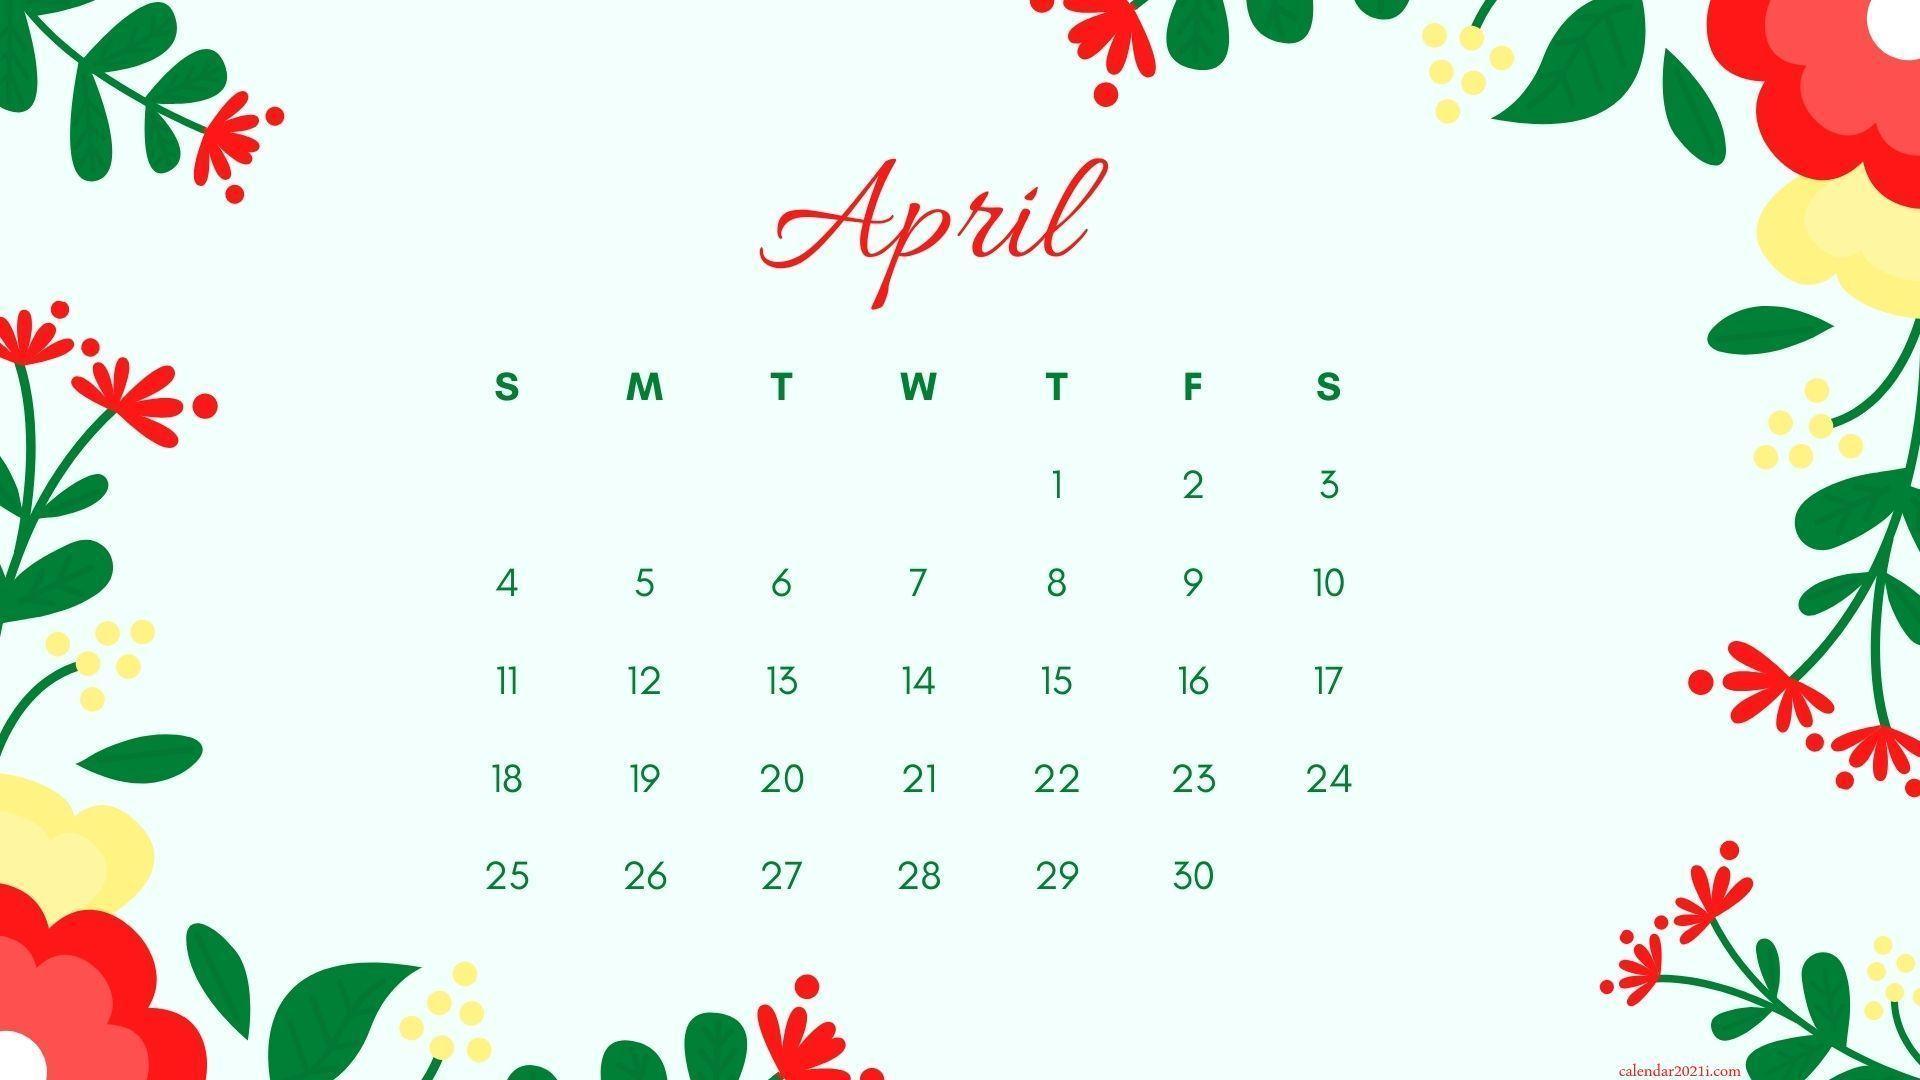 April 2021 Wallpaper Calendar April 2021 Calendar Wallpapers   Top Free April 2021 Calendar